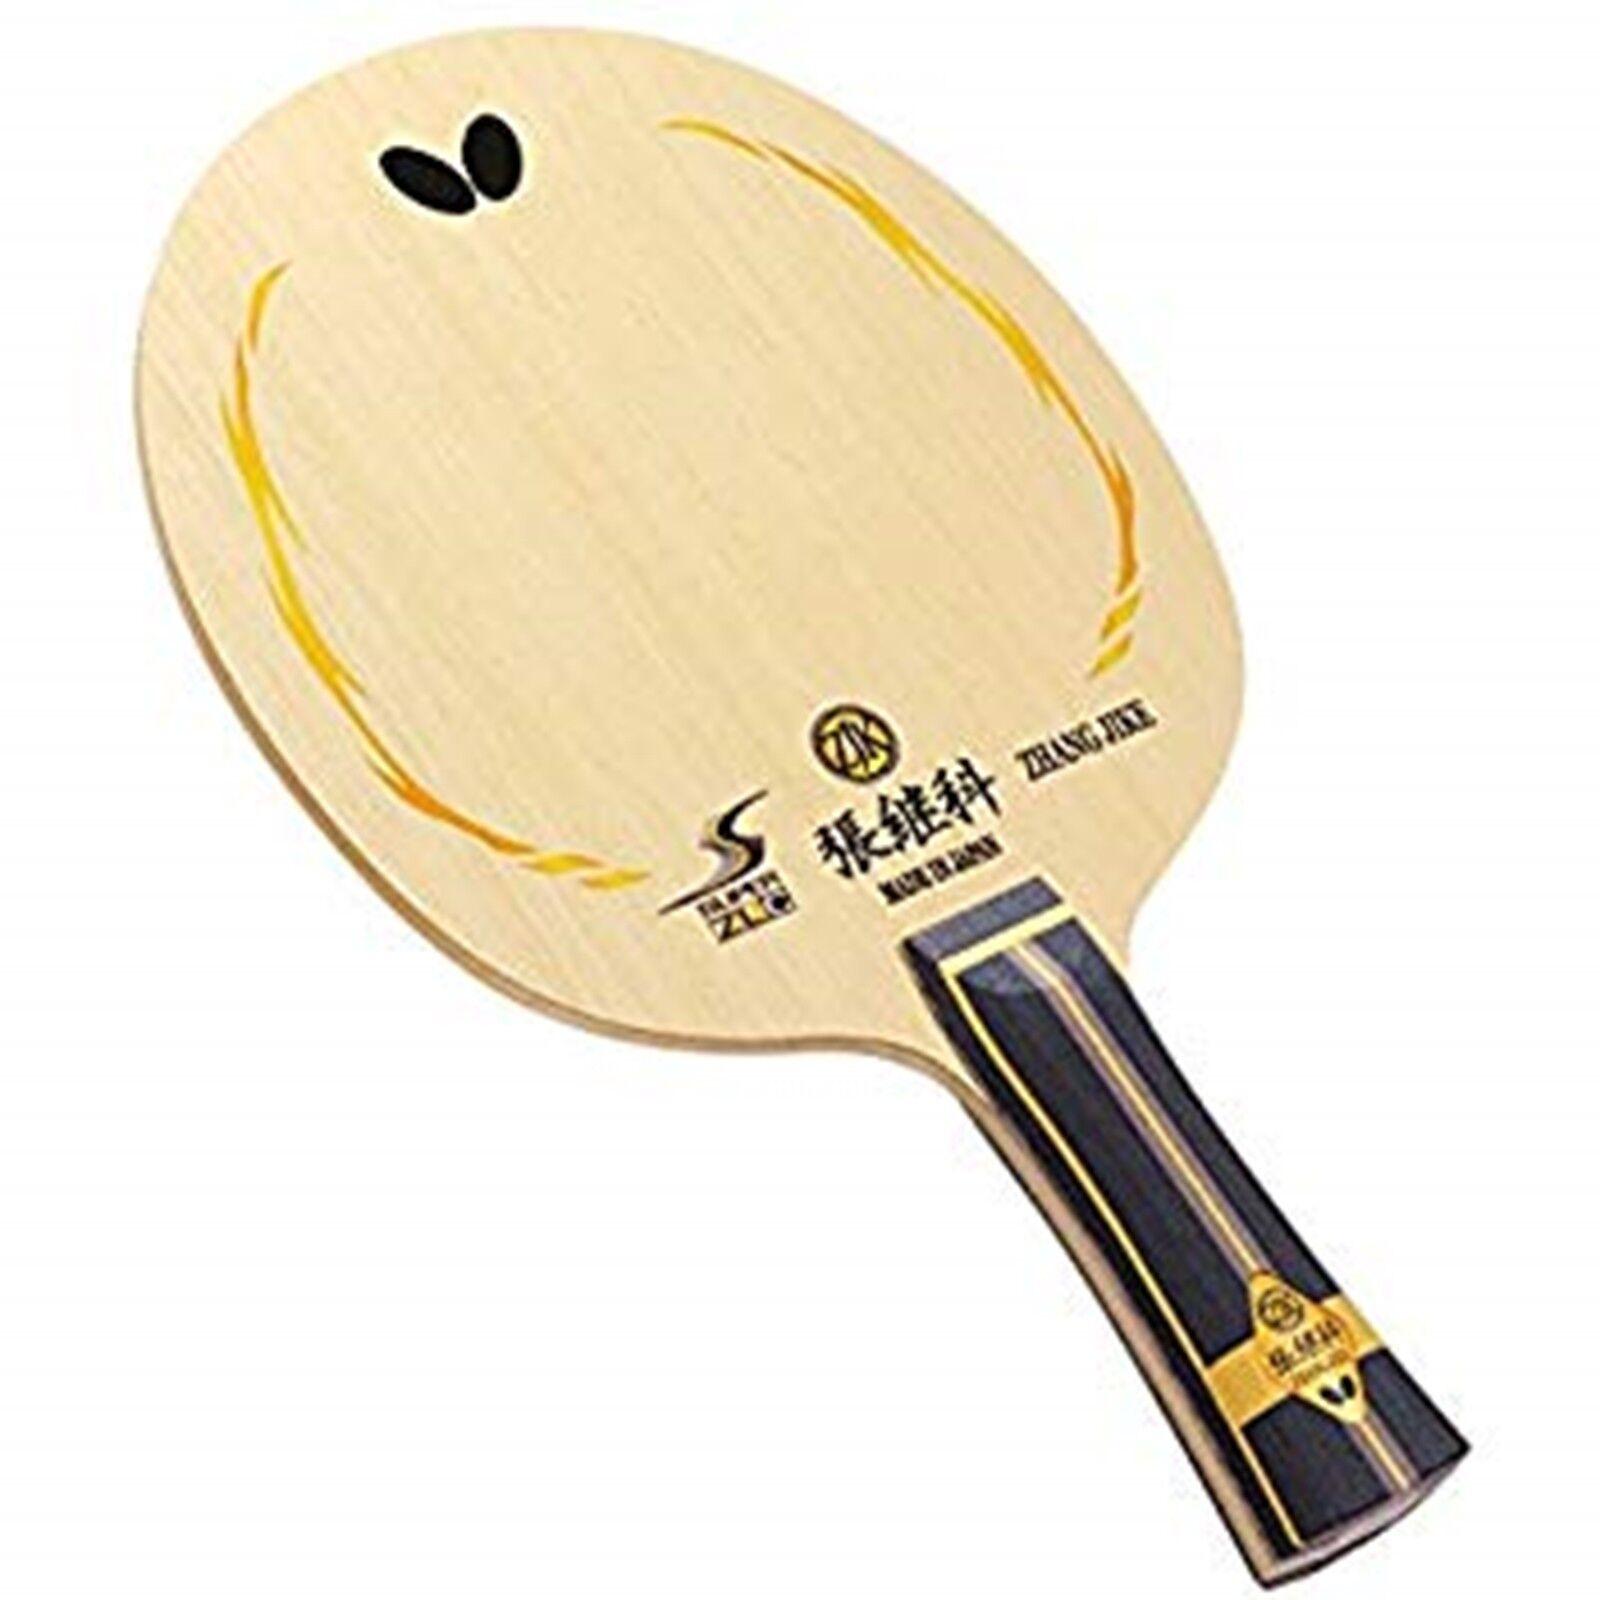 Butterfly Súper  Zlc Zhang Jike Anzuelo 36541 Mesa Raqueta de Tenis Japan Nuevo  ventas en linea